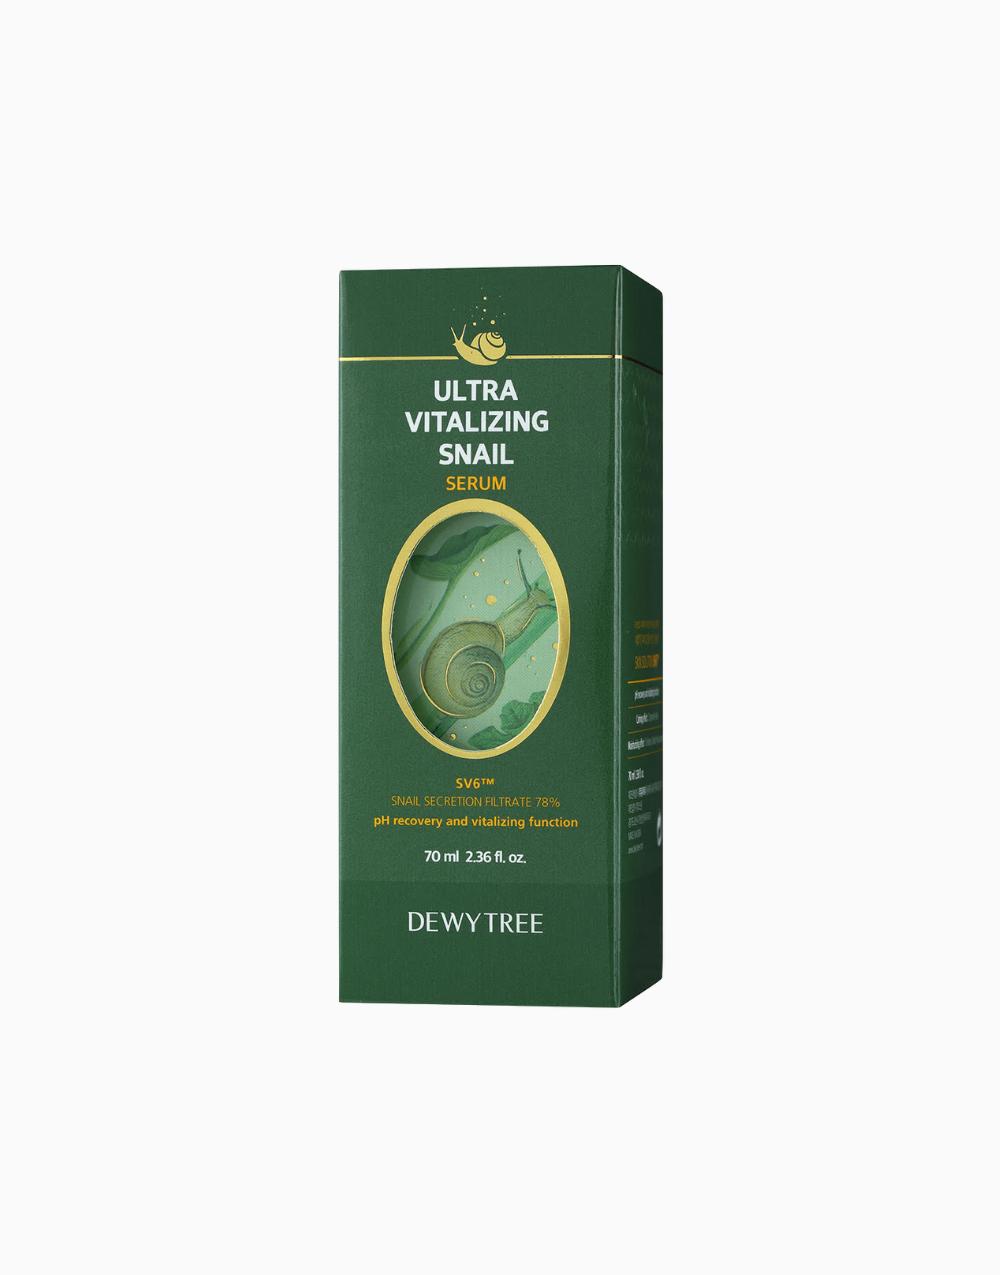 Ultra Vitalizing Snail Serum by Dewytree